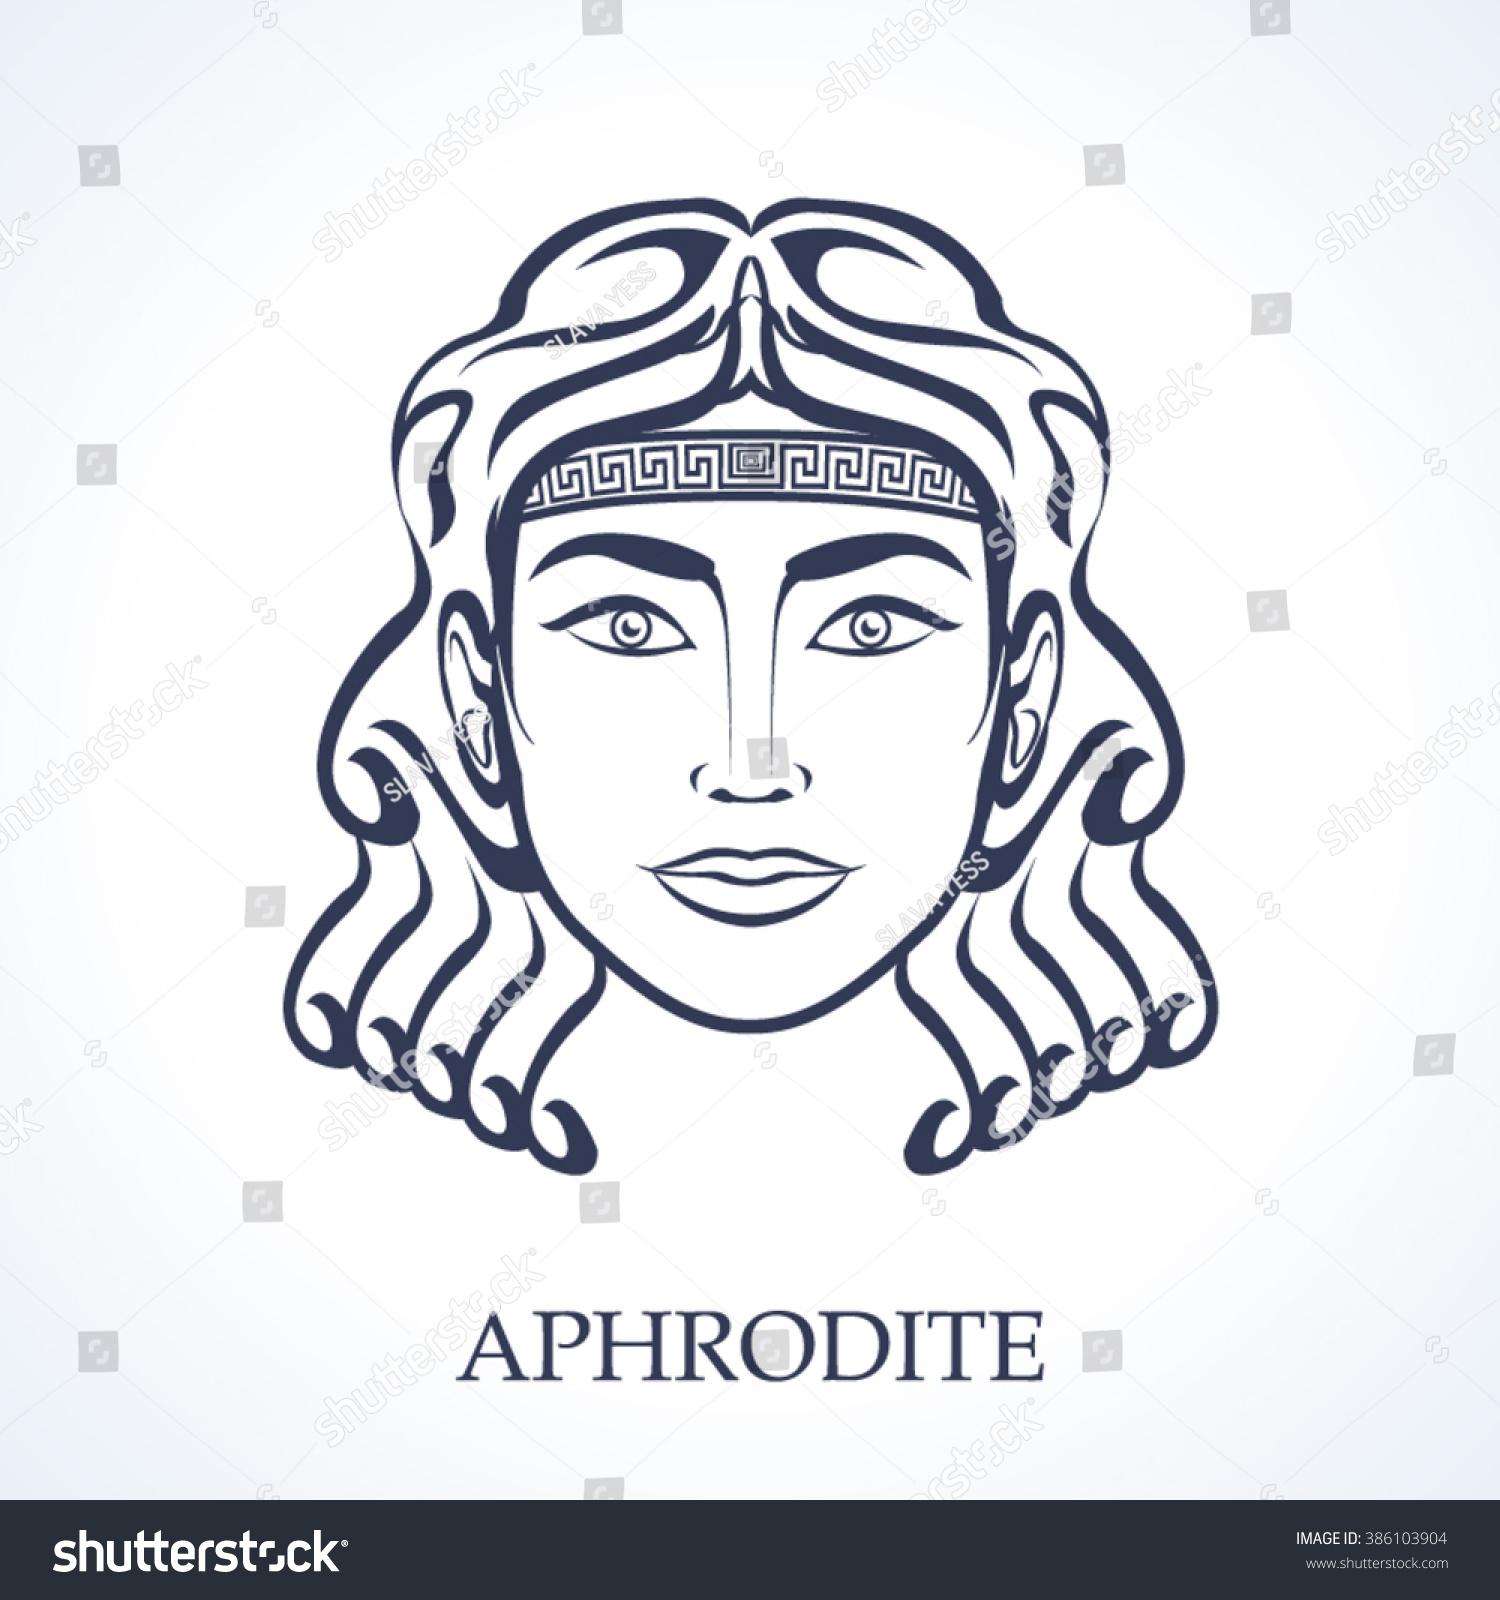 Artemis The Greek Goddess Of Hunting Ez Canvas